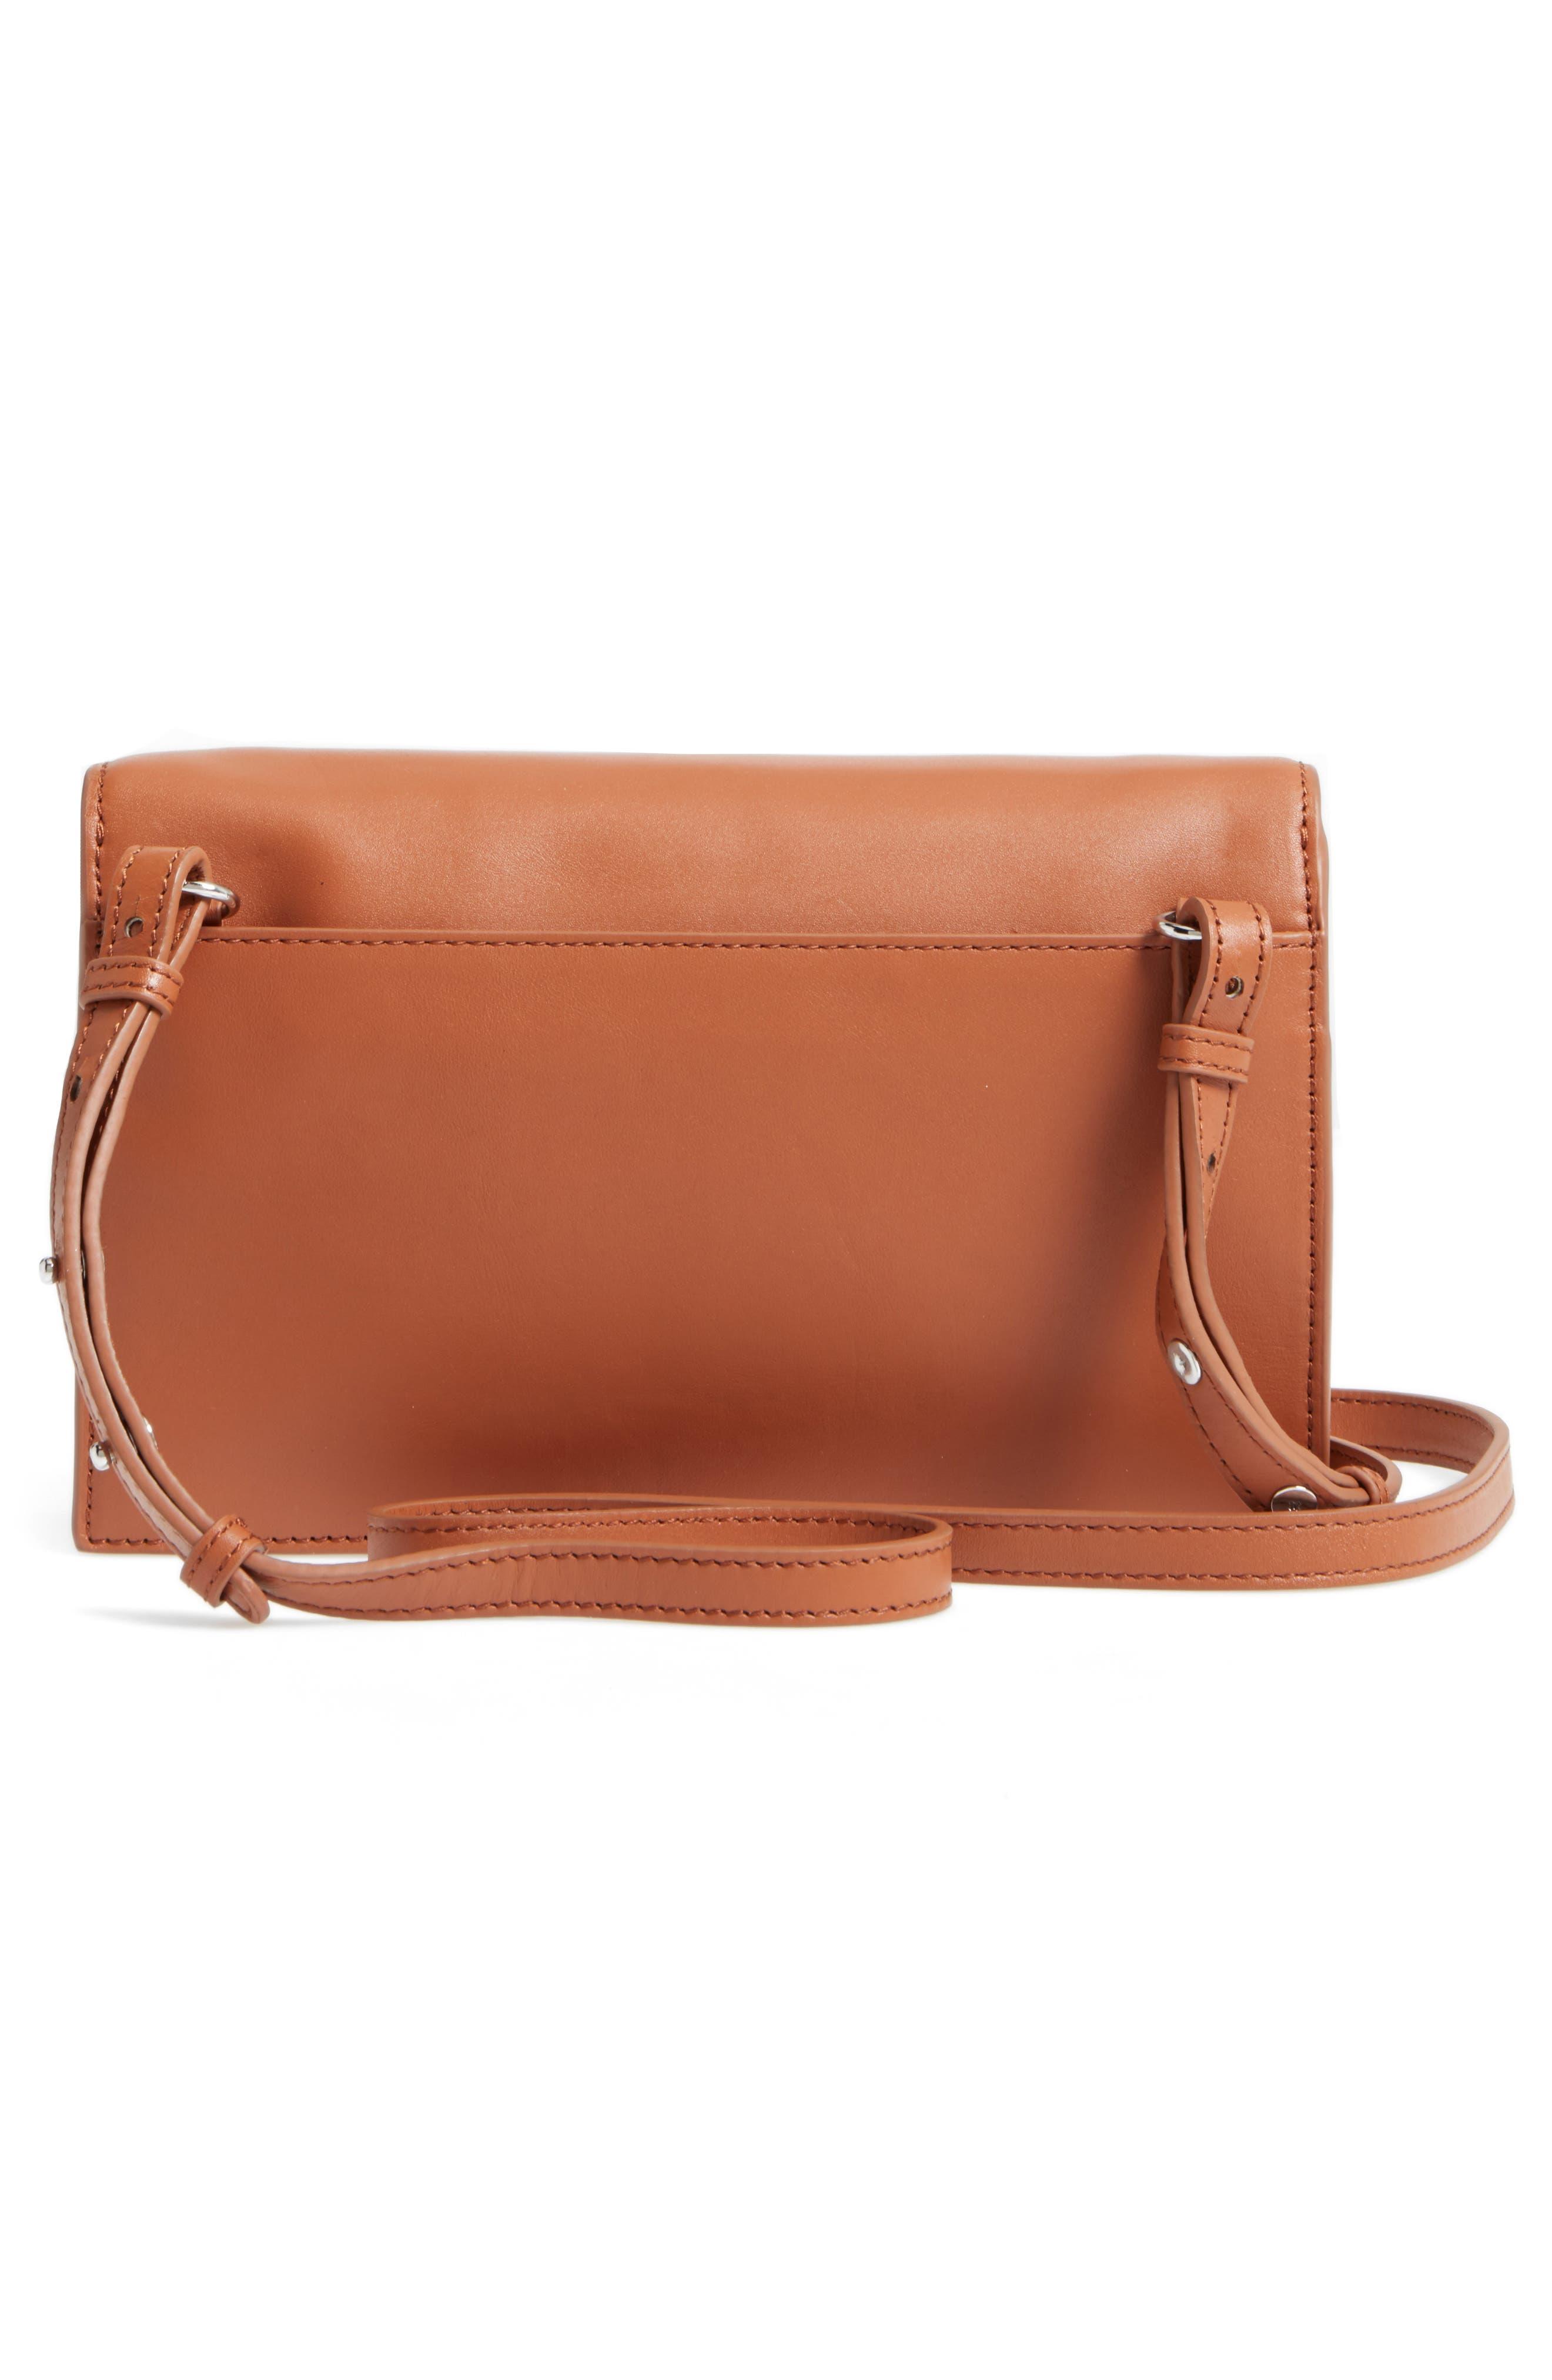 Easton Leather Envelope Crossbody Bag,                             Alternate thumbnail 3, color,                             200